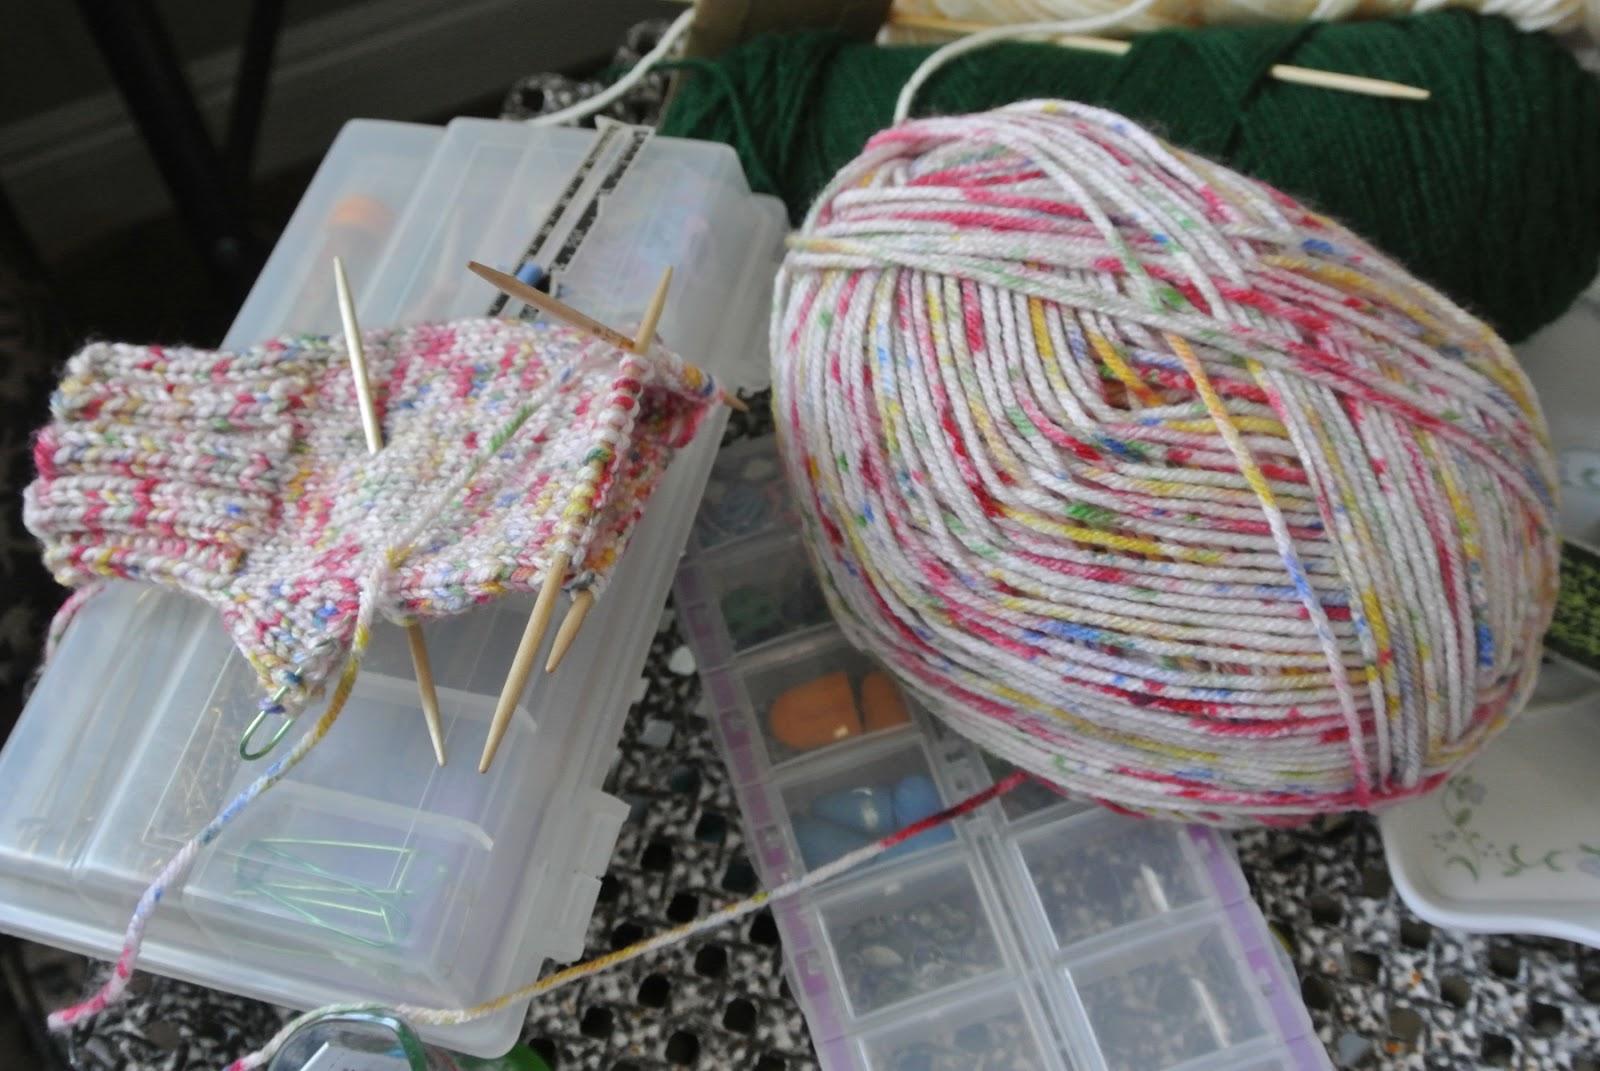 Big Twist Yarn Patterns Magnificent Design Ideas